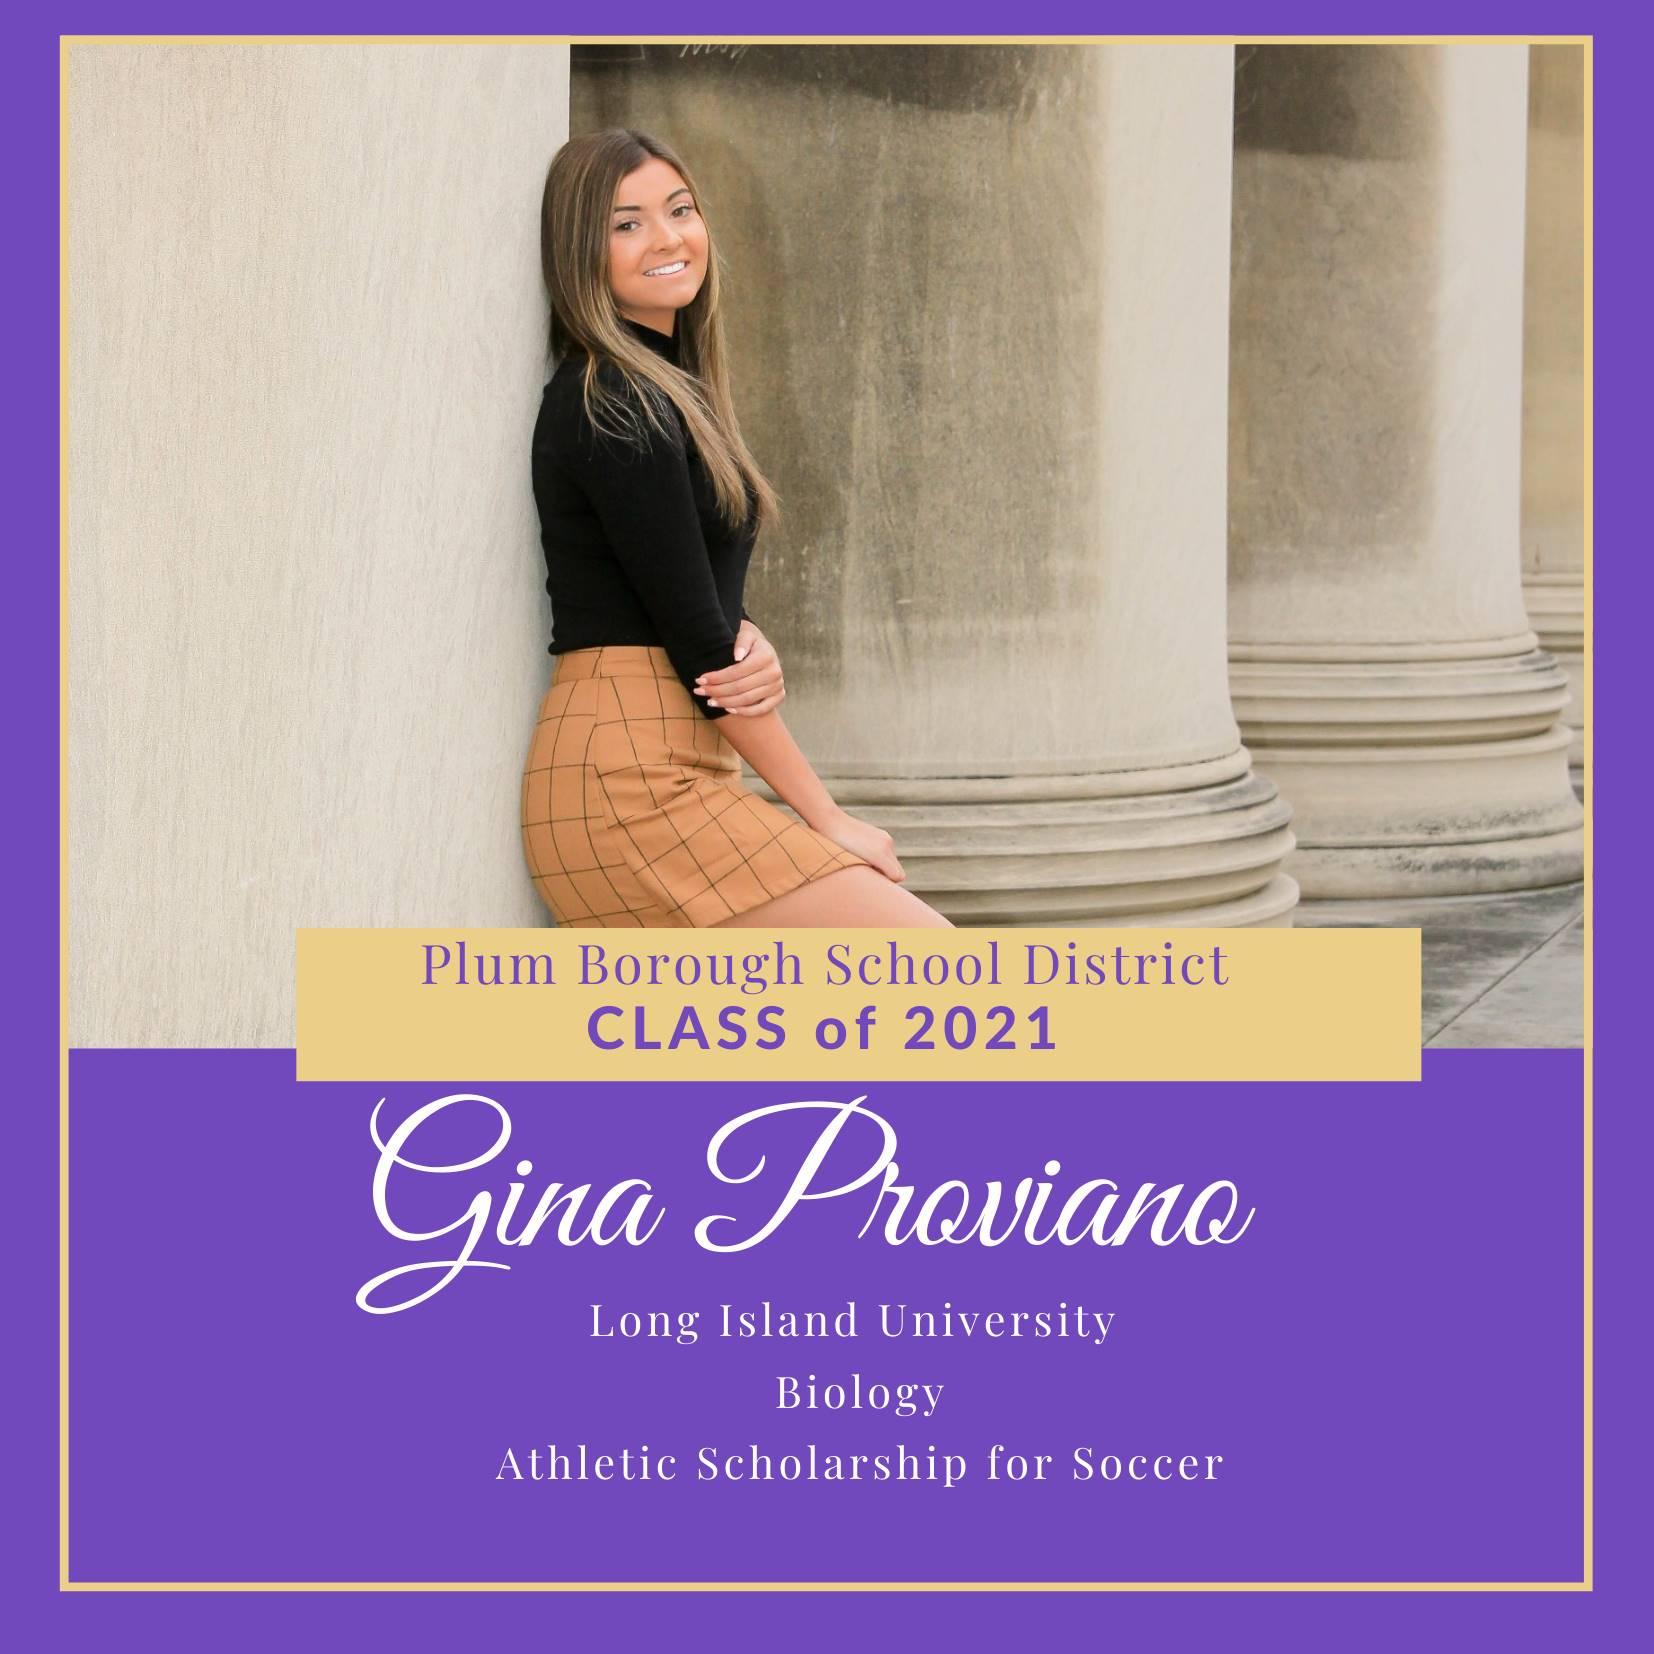 Congratulations to Gina Proviano, Class of 2021!